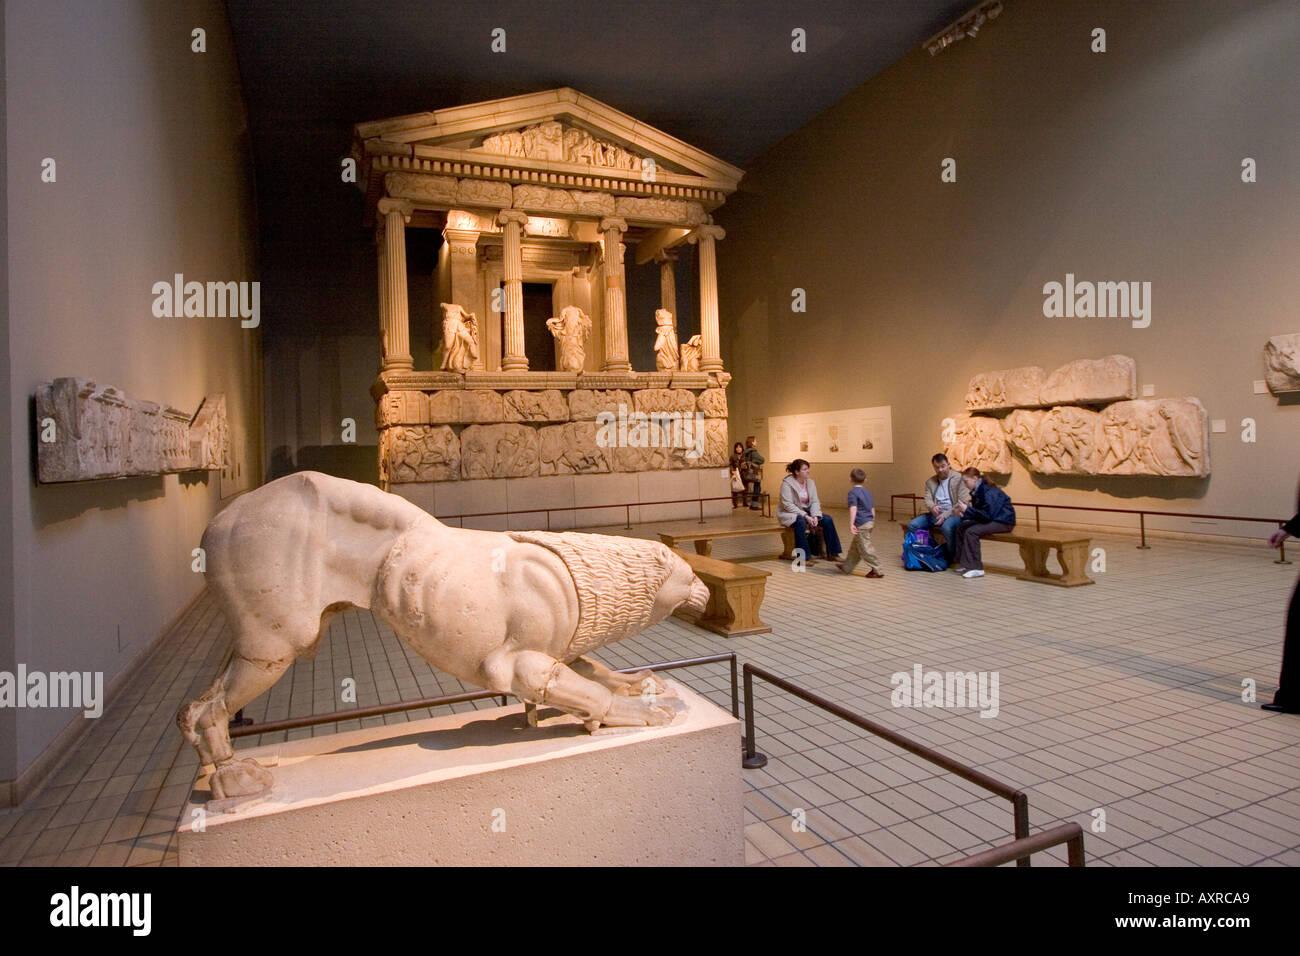 Ancient Greek Exhibits in British Museum London England London GB UK - Stock Image